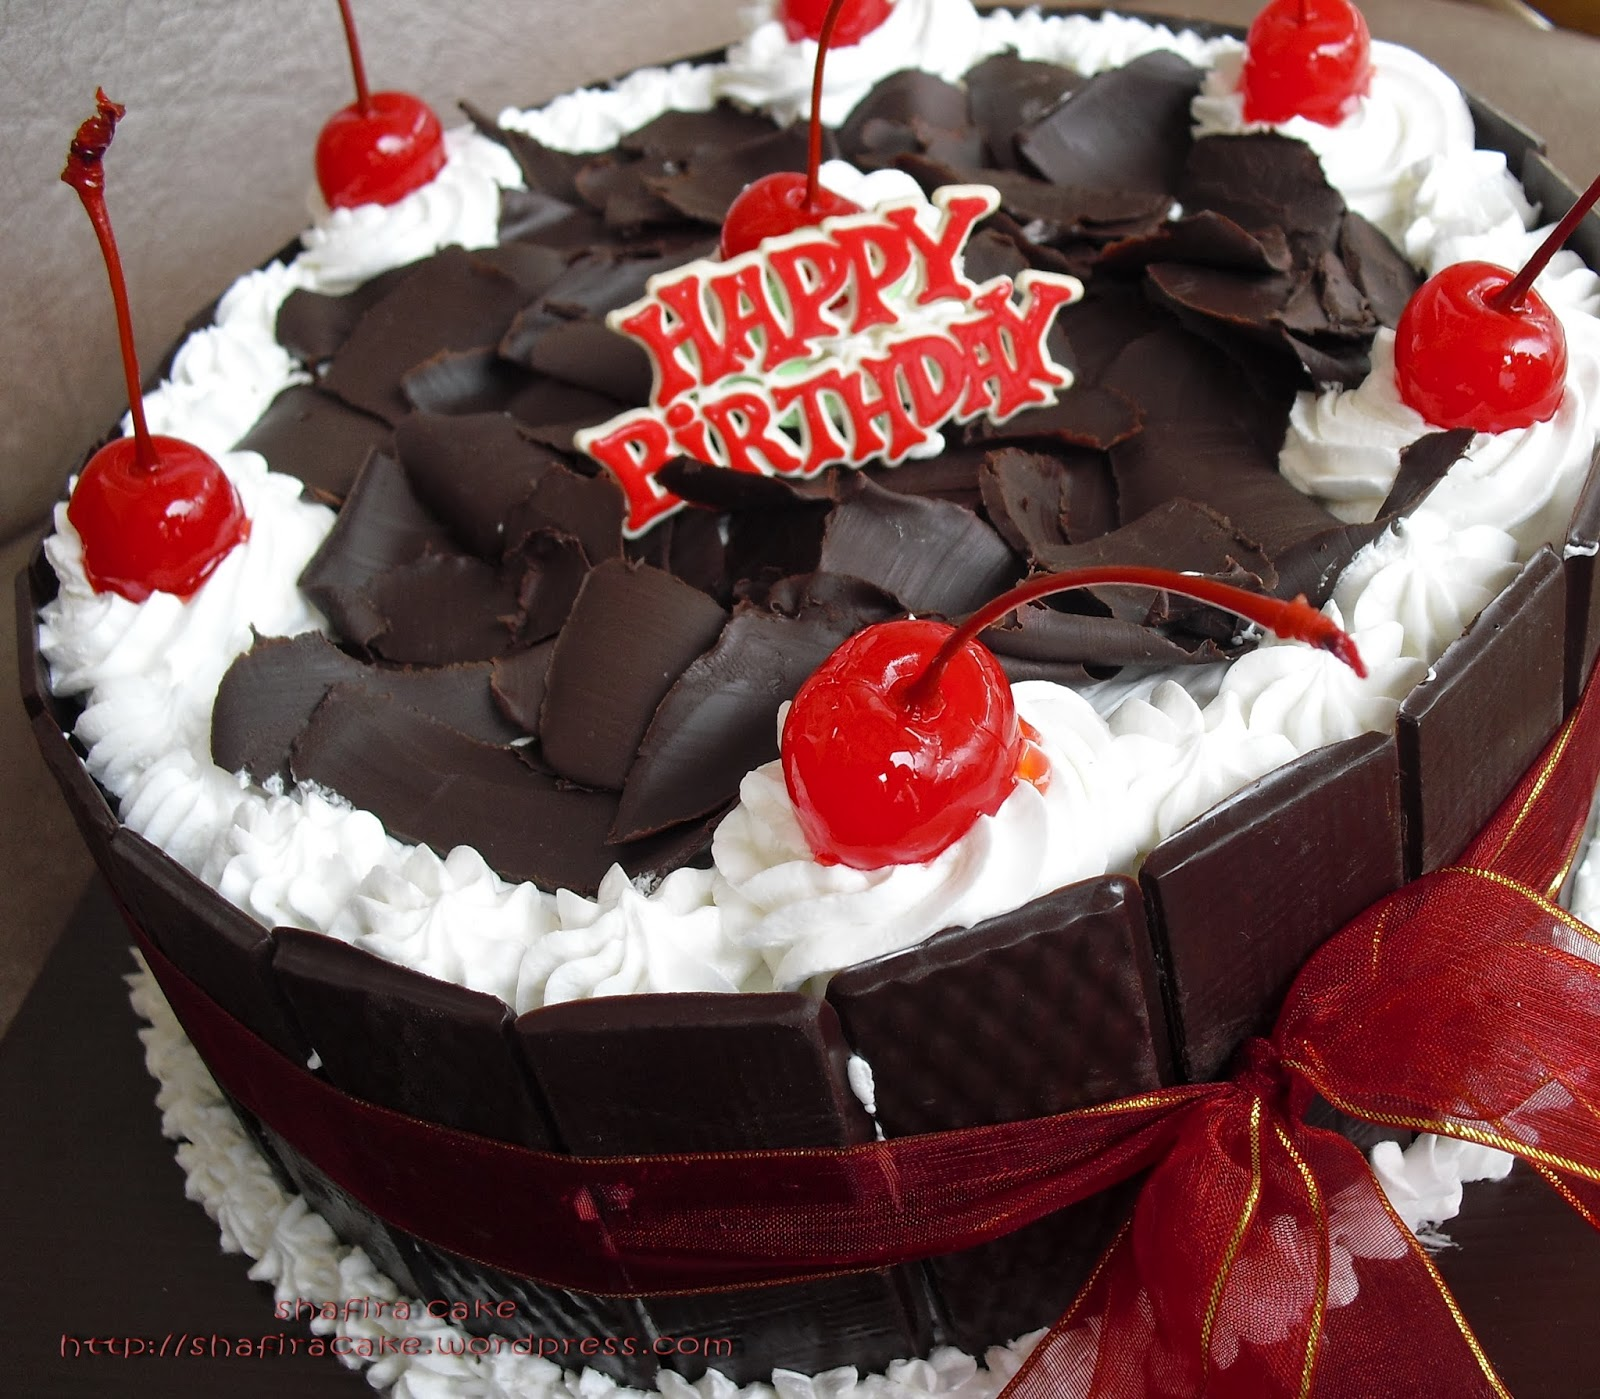 cara membuat kue ulang tahun mudah dan sederhana